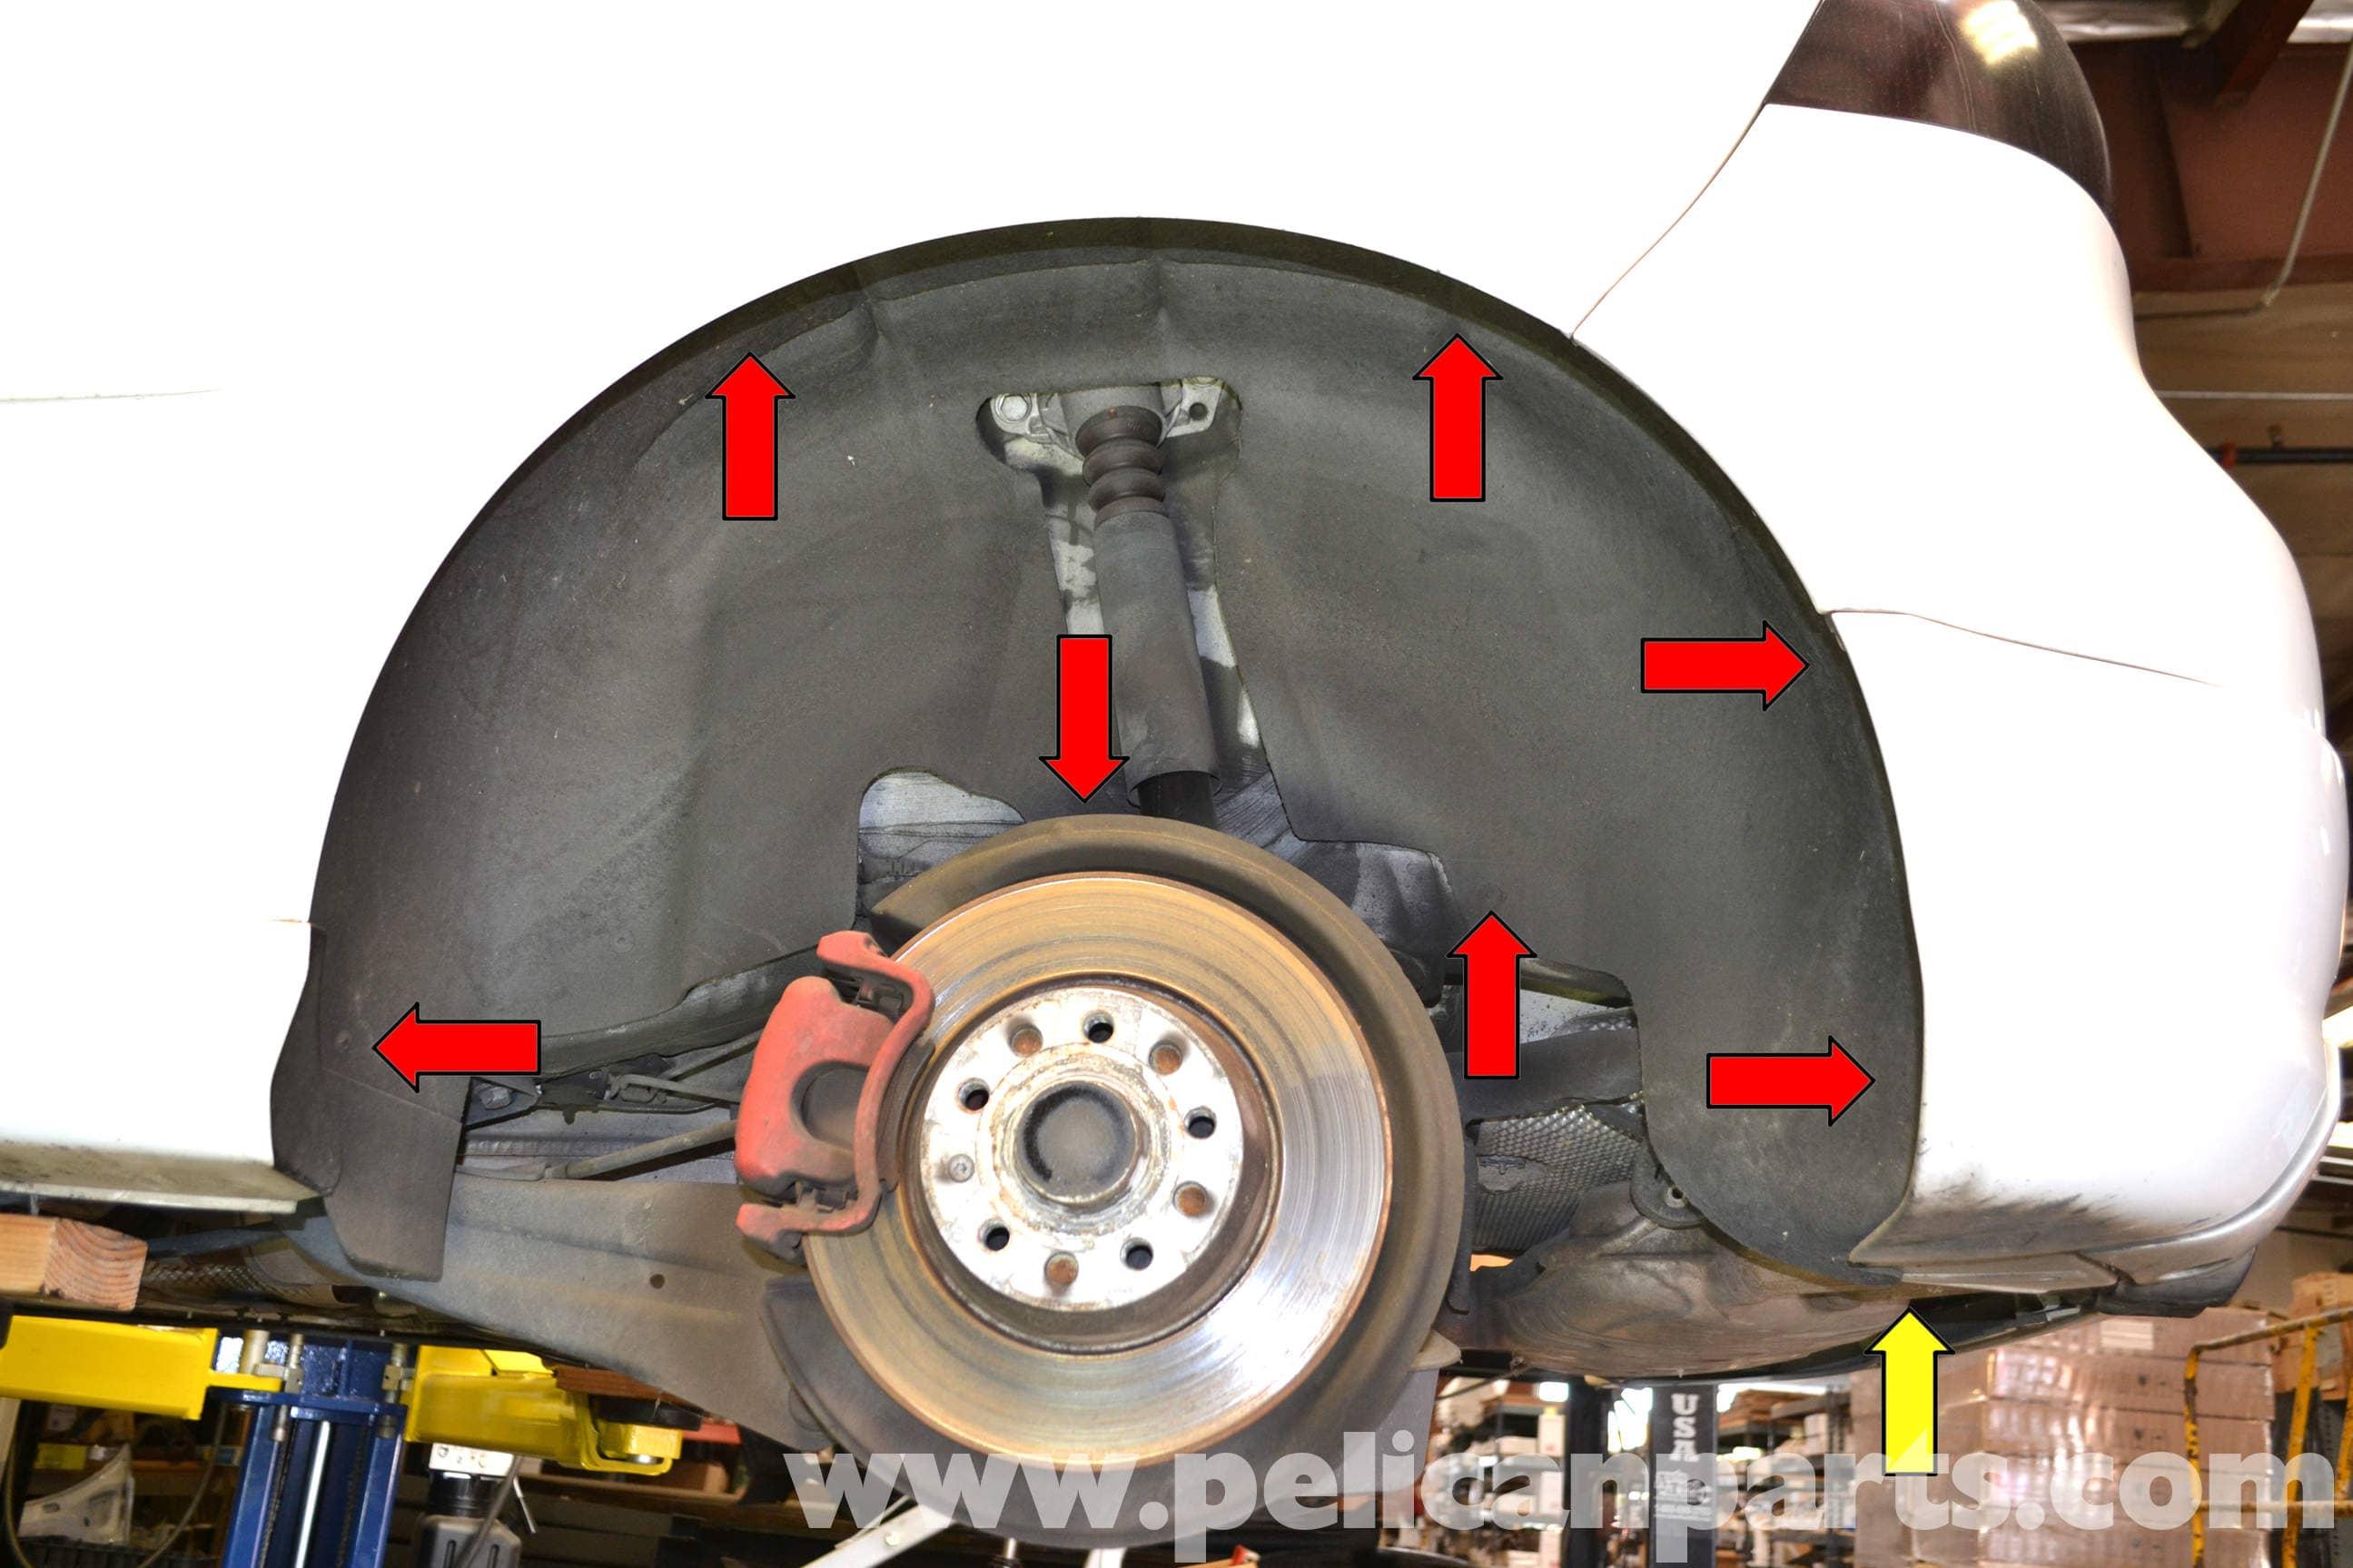 Volkswagen Golf GTI Mk V Wheelwell Liner Removal (2006-2009 ... d9944518a